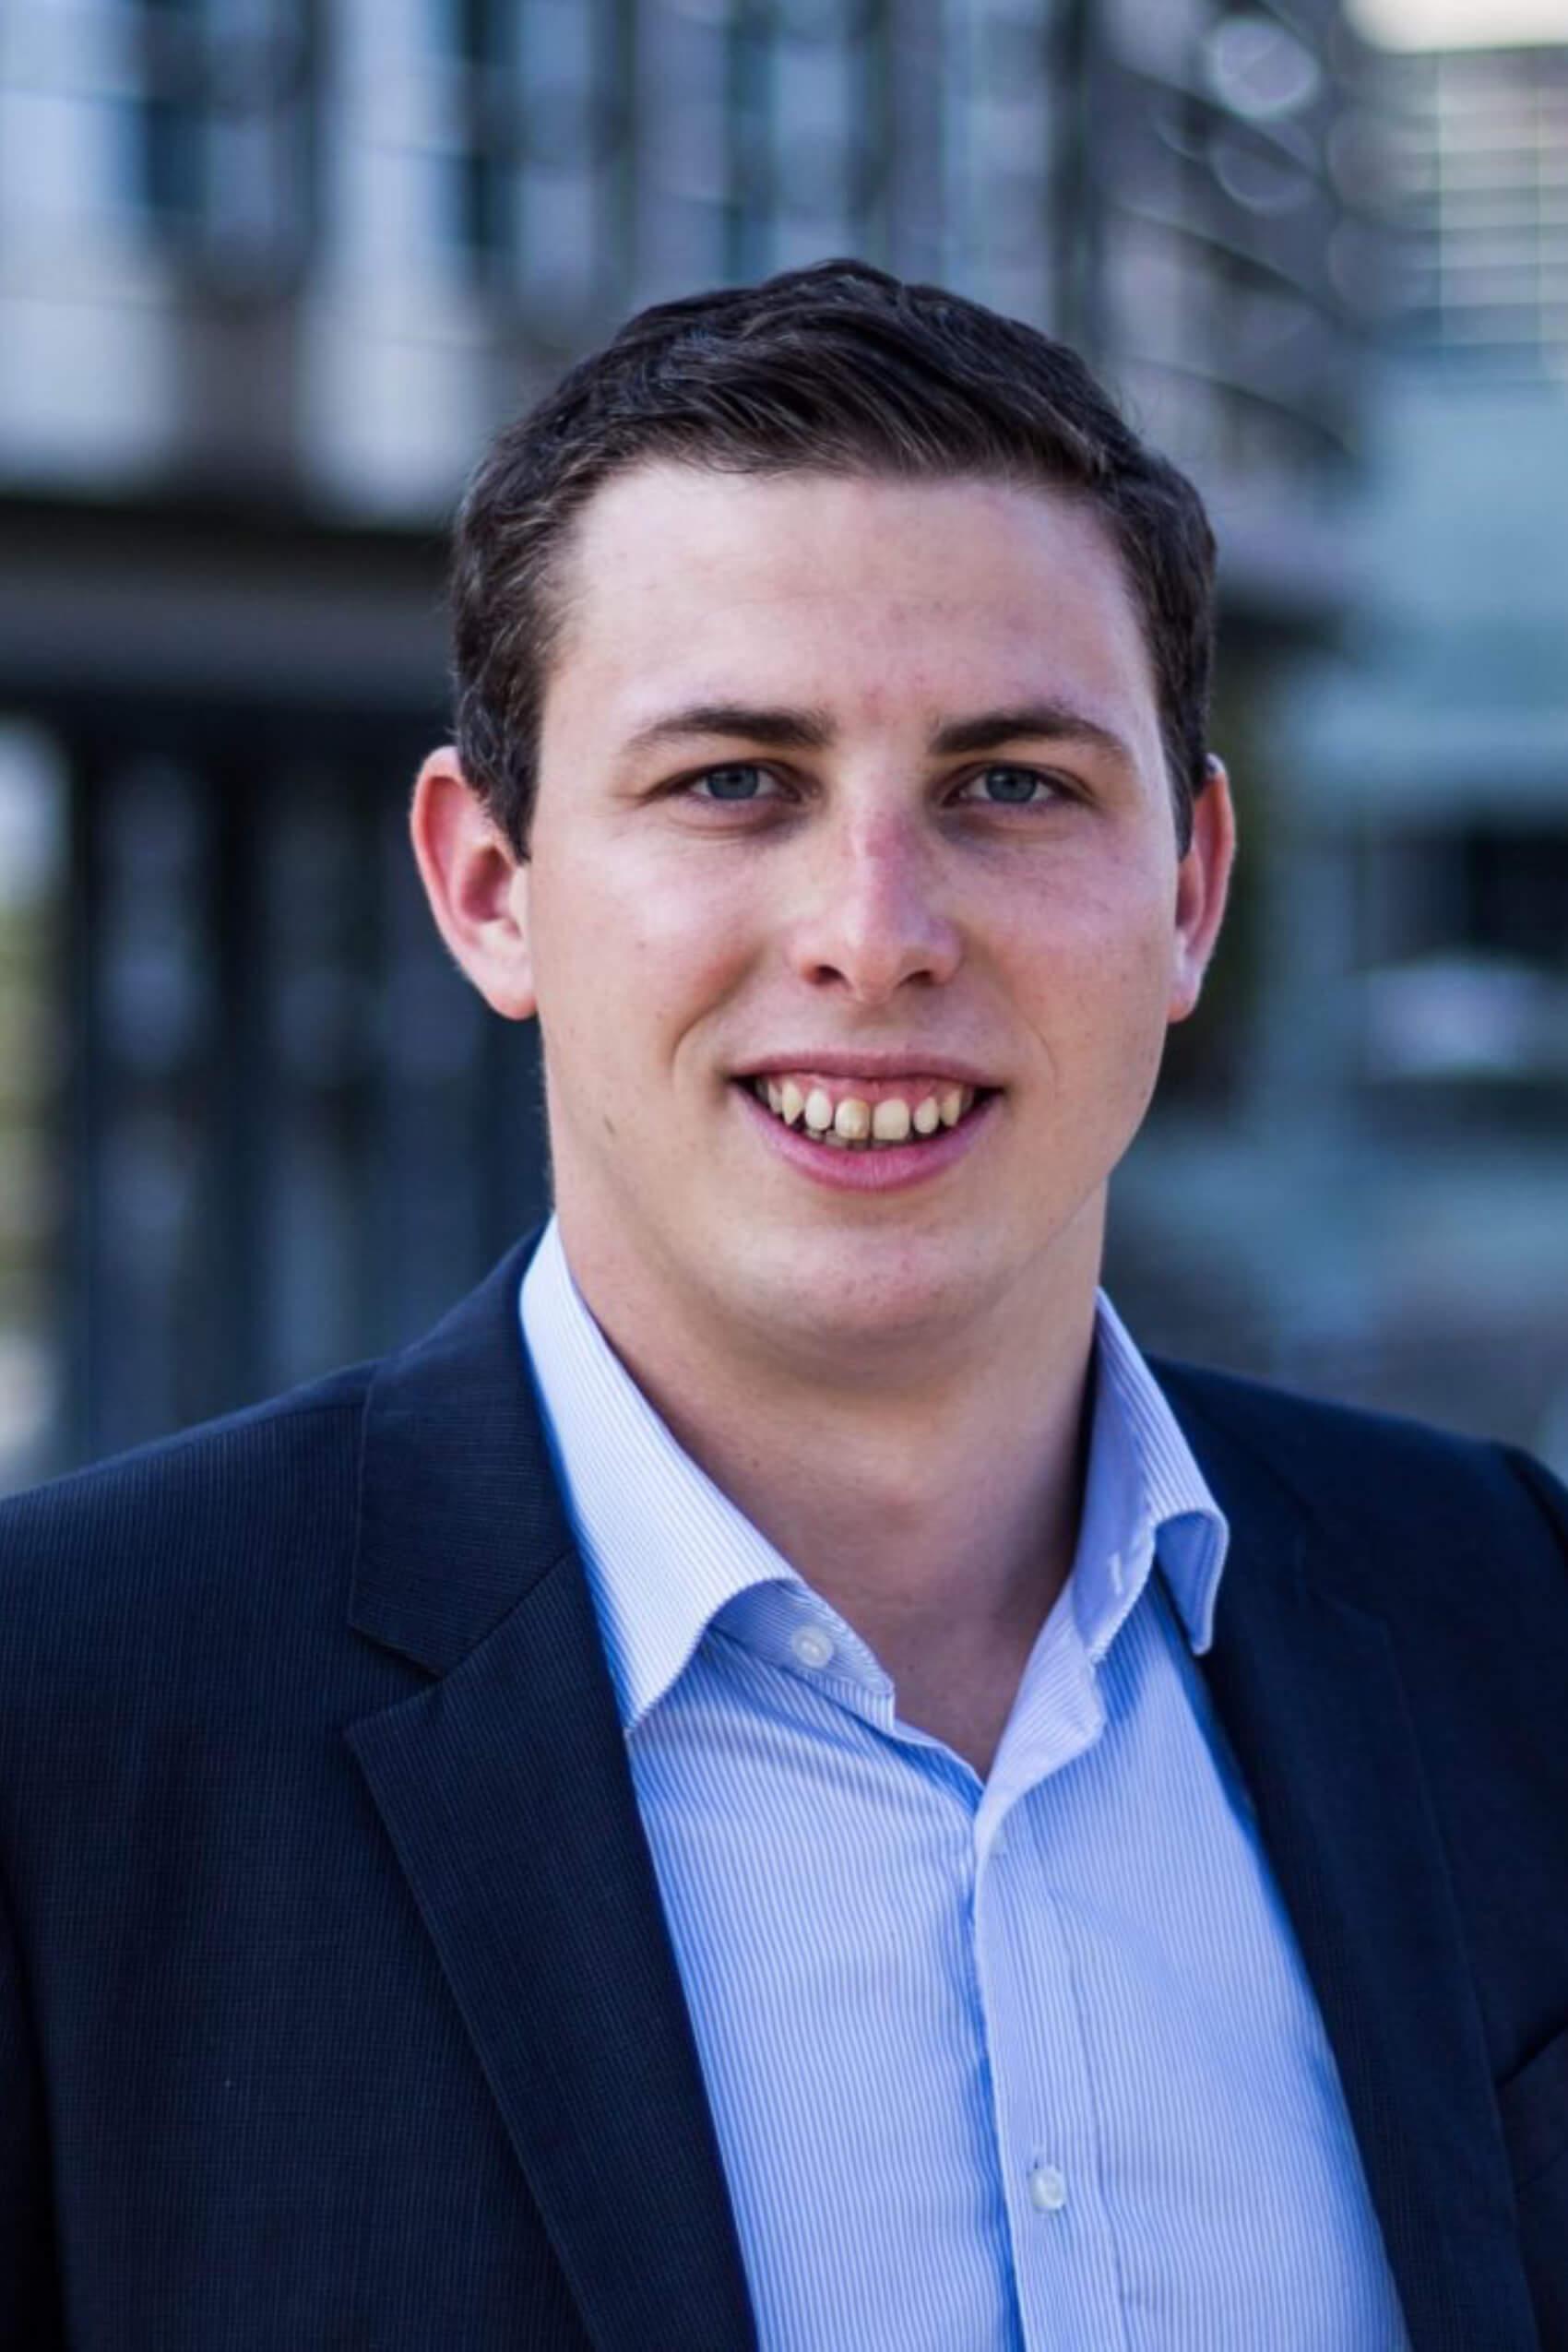 Junge OEVP Internationaler Sekretär Michael Stellwag